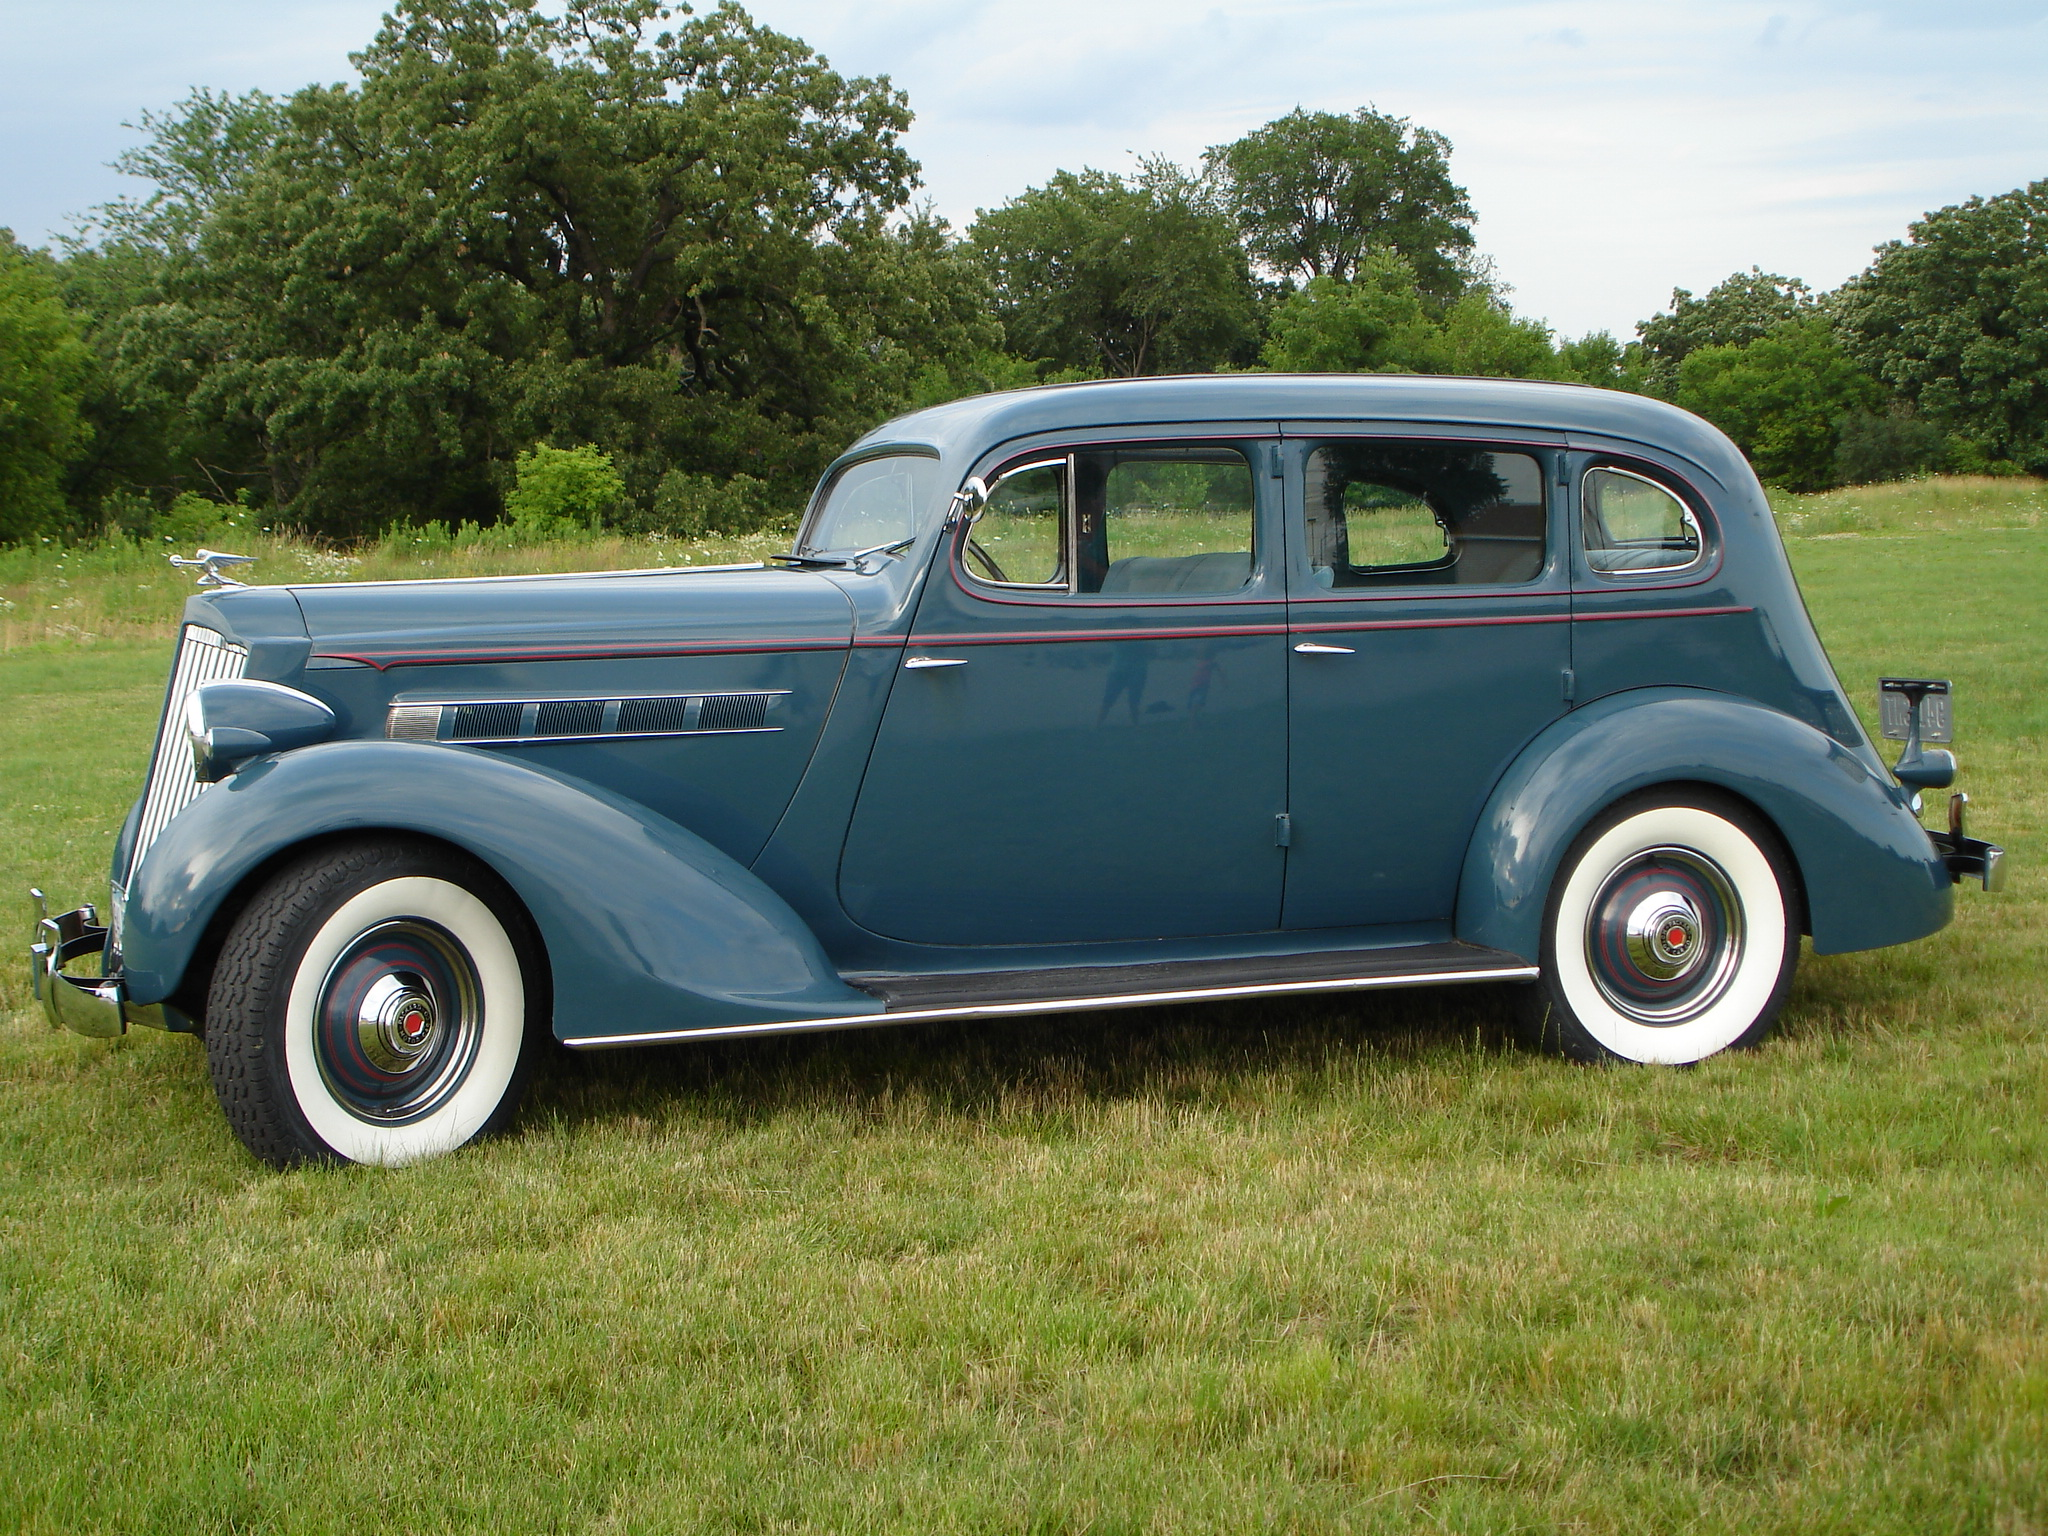 1935 Packard Model 893 Standard 4 door sedan